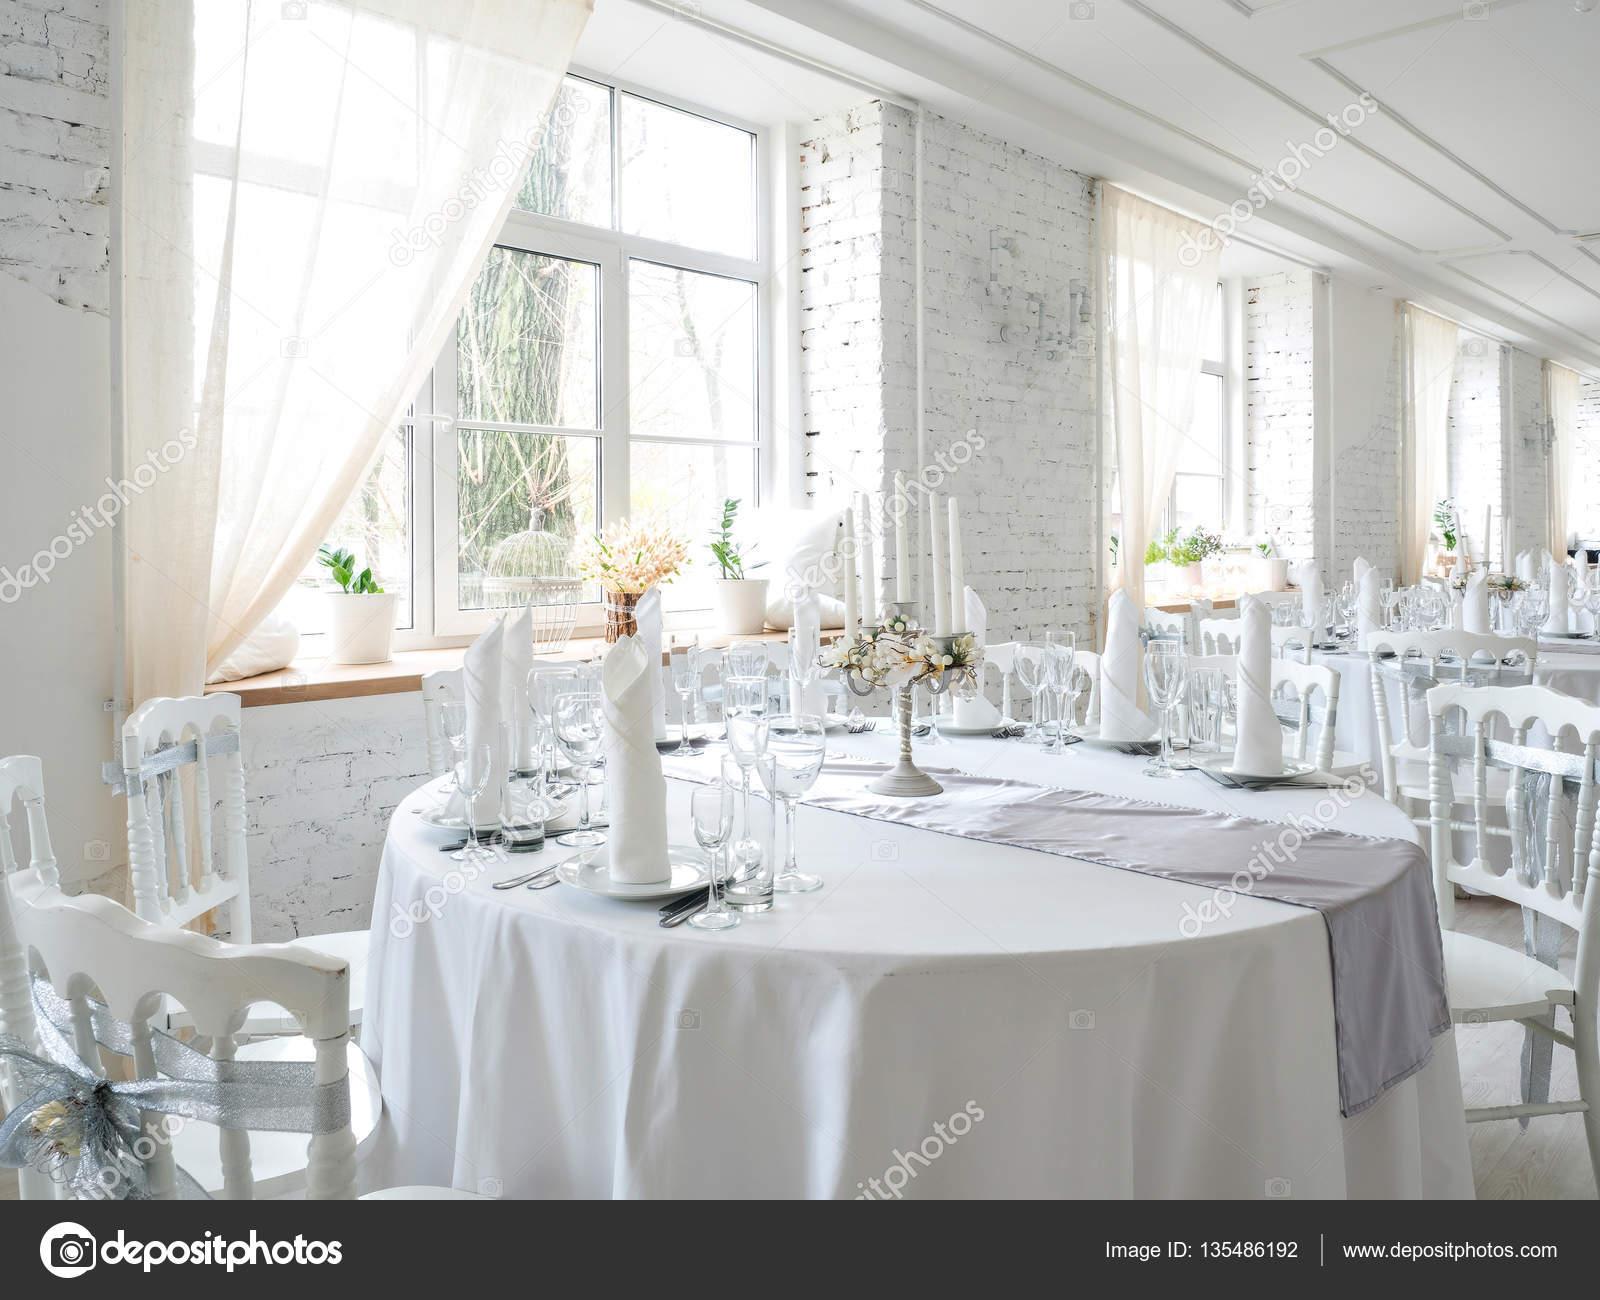 Grote Witte Tafel : Interieur van het restaurant met grote witte tafel u stockfoto